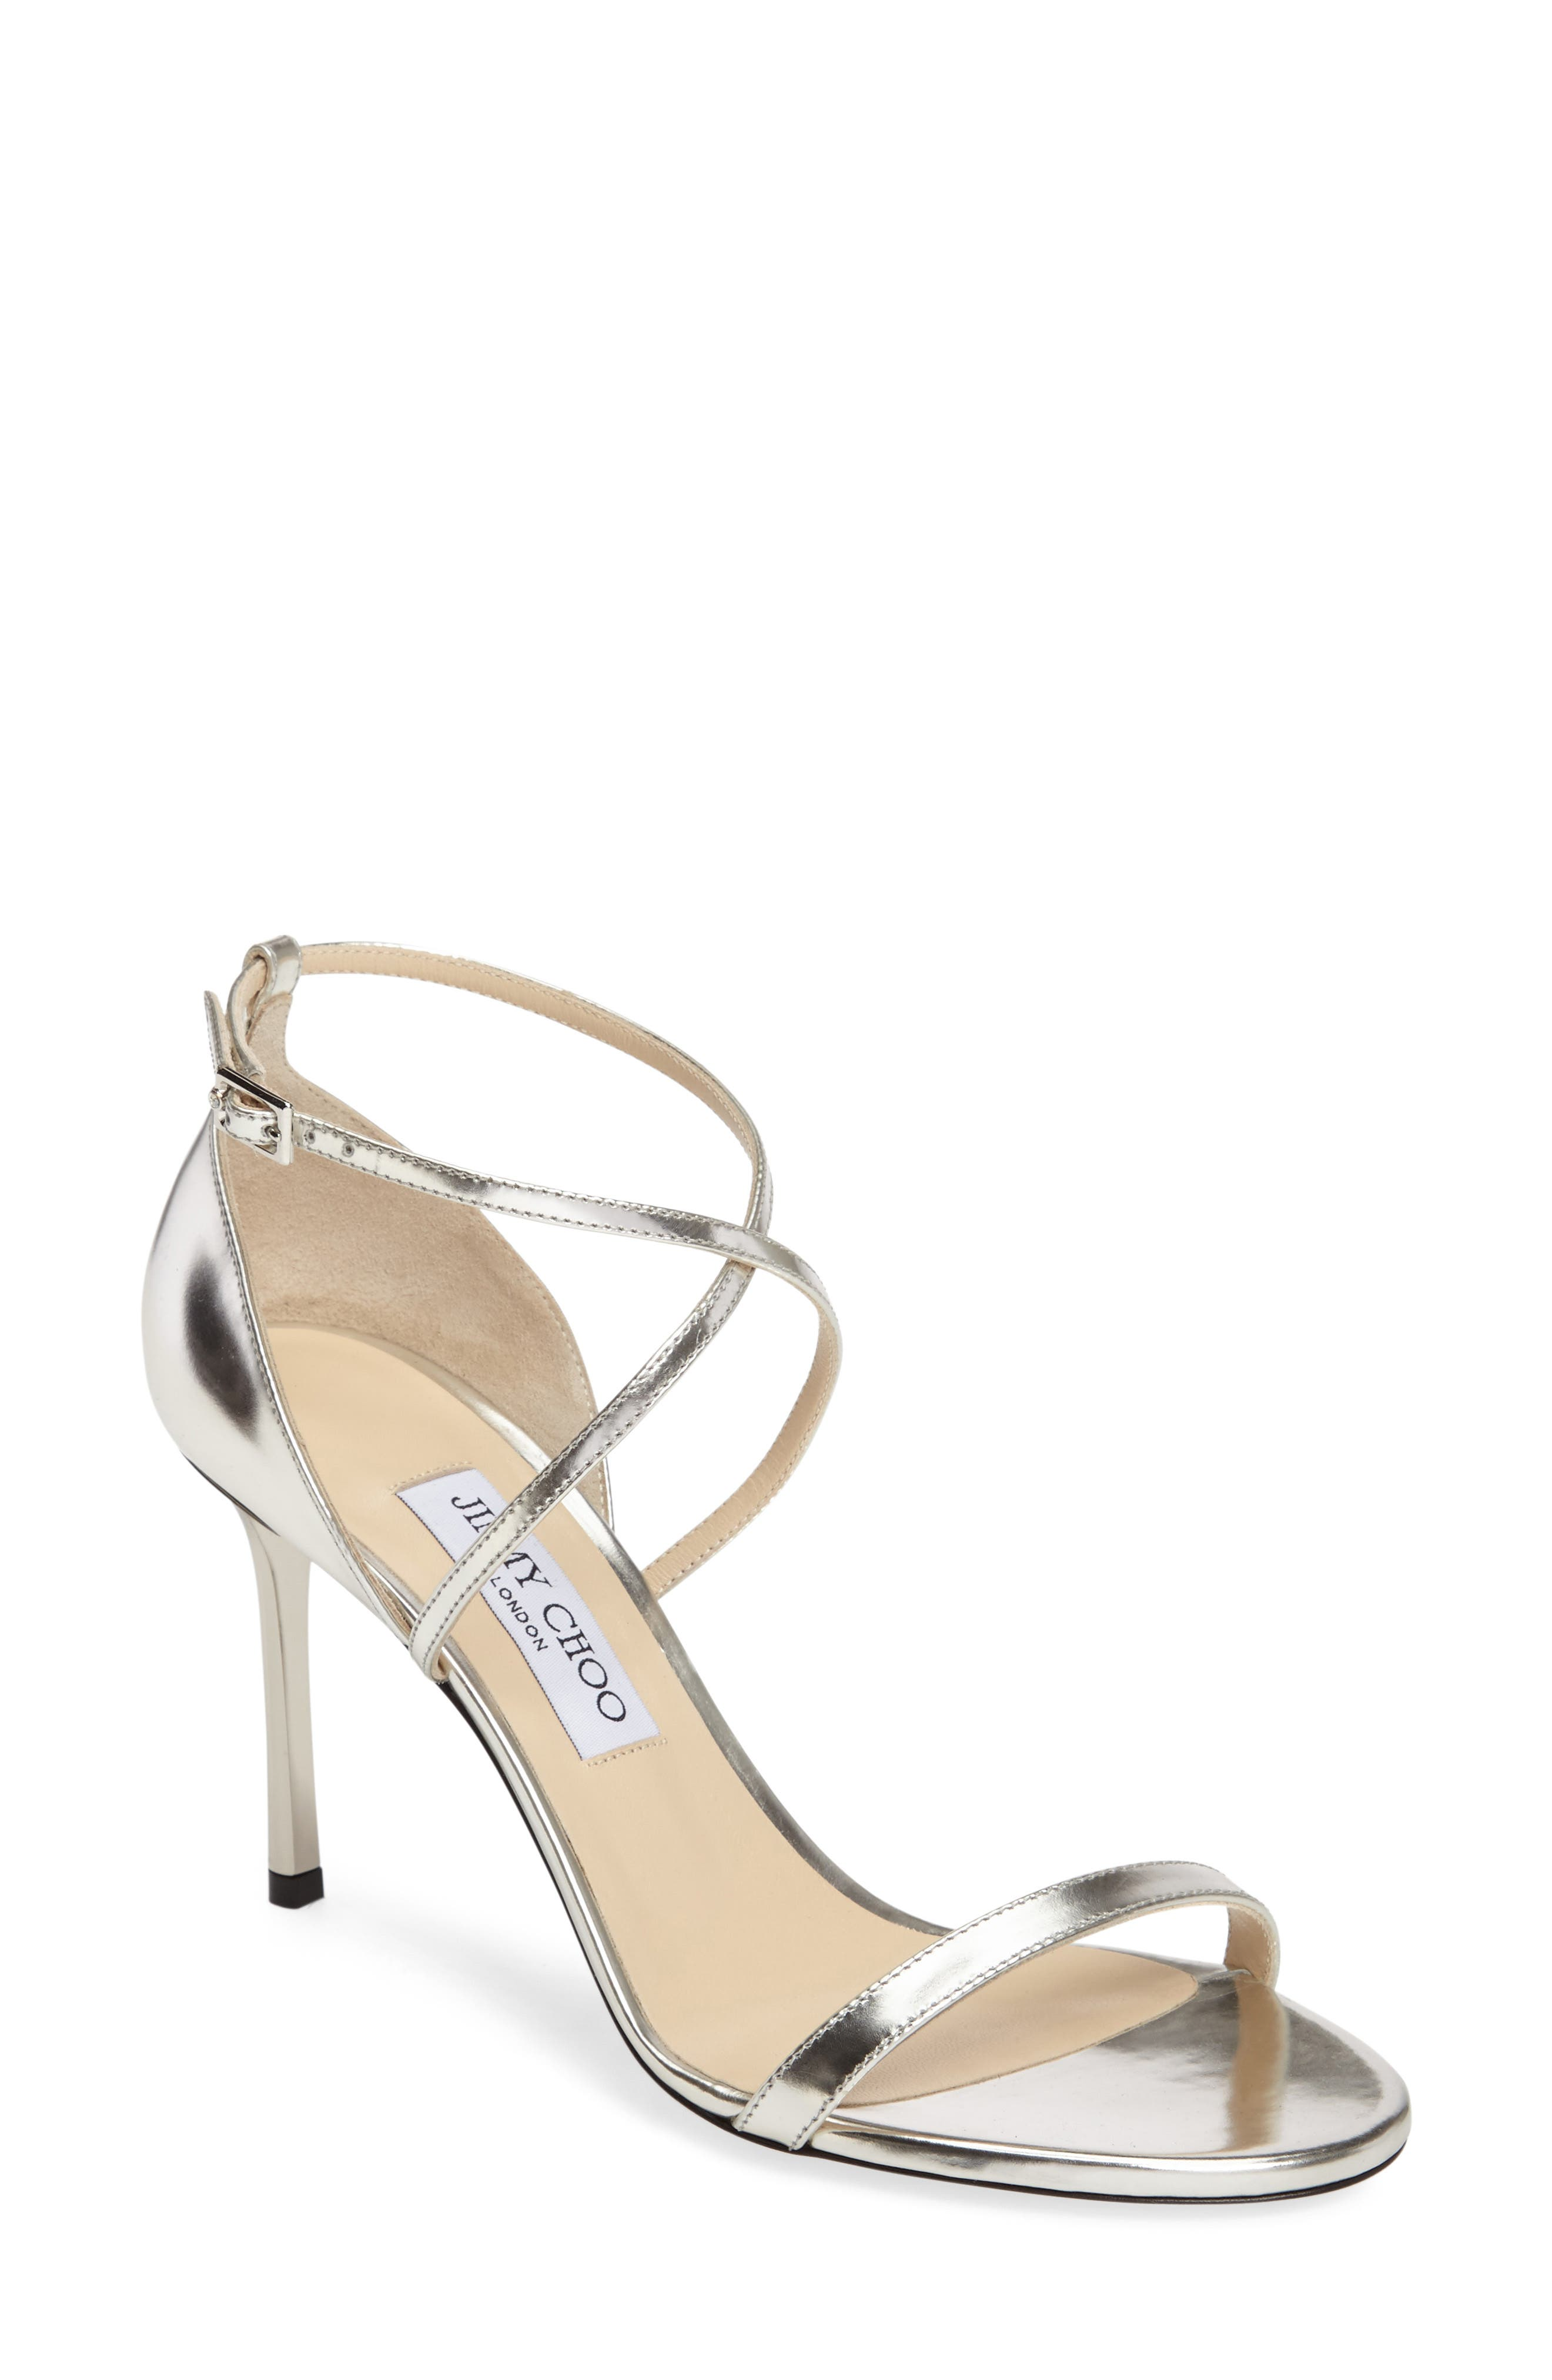 'Hesper' Ankle Strap Sandal,                             Main thumbnail 1, color,                             Silver